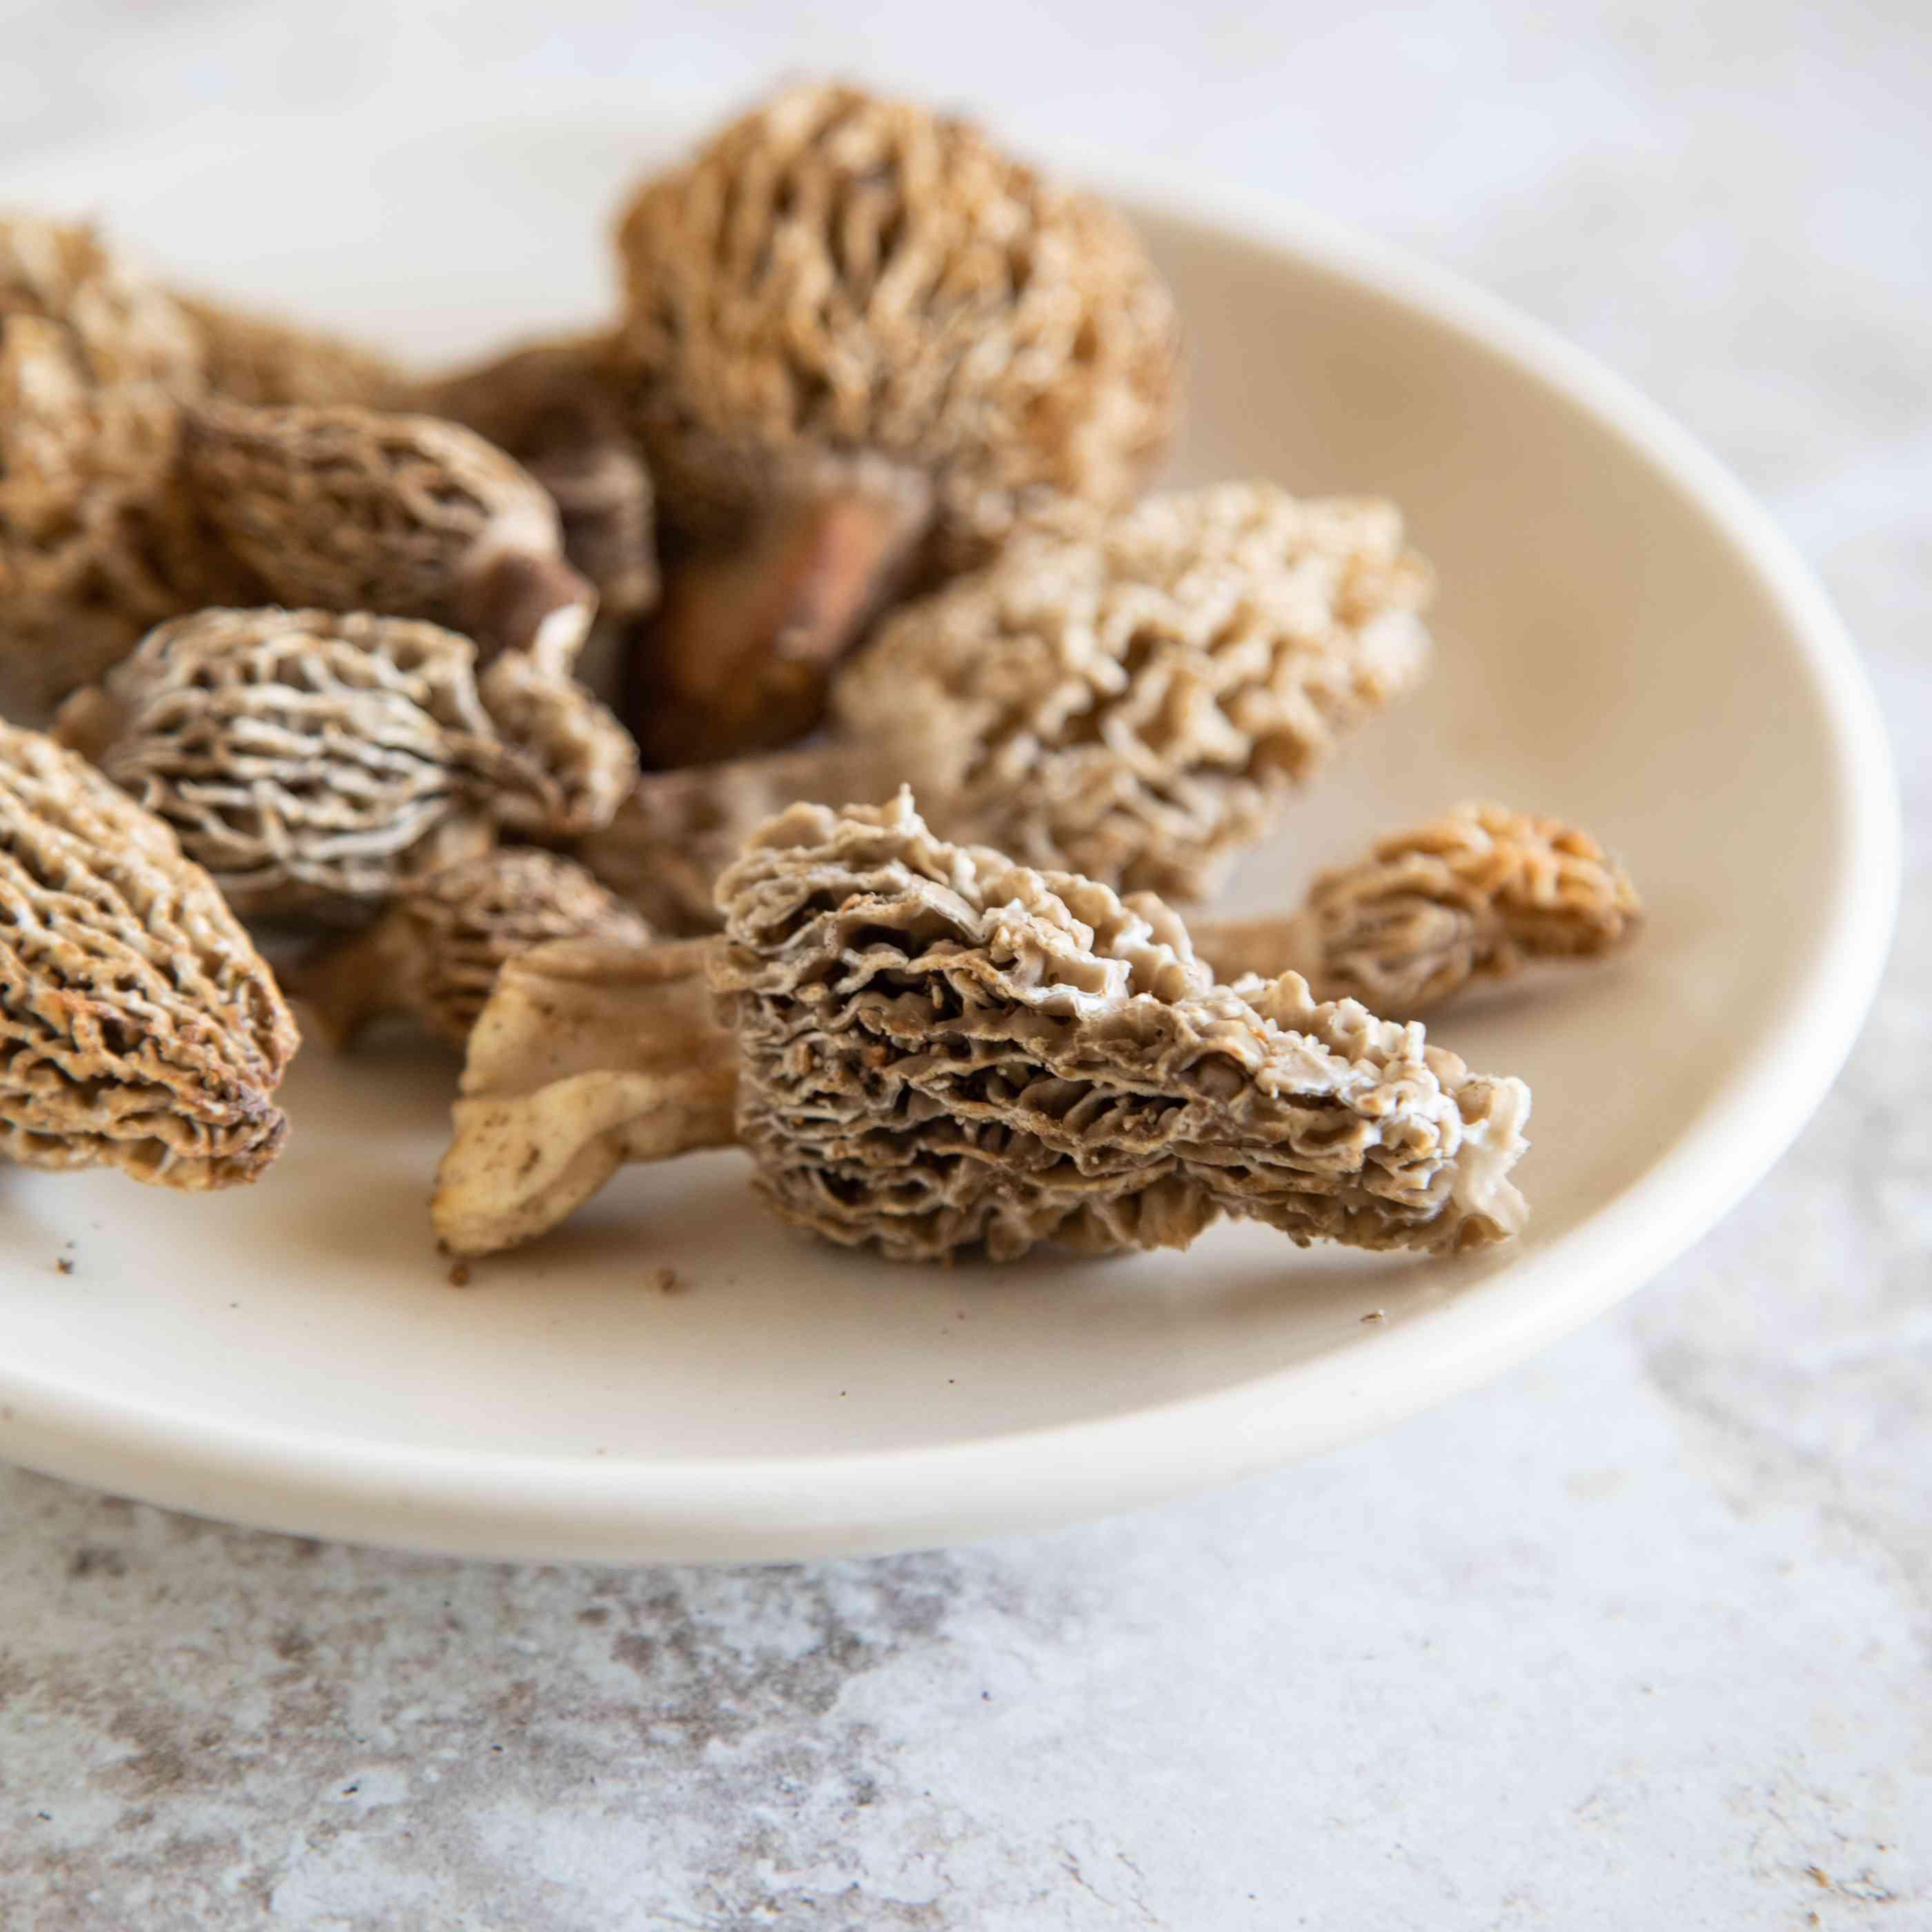 Closeup of veiny brown morel mushroom on white plate